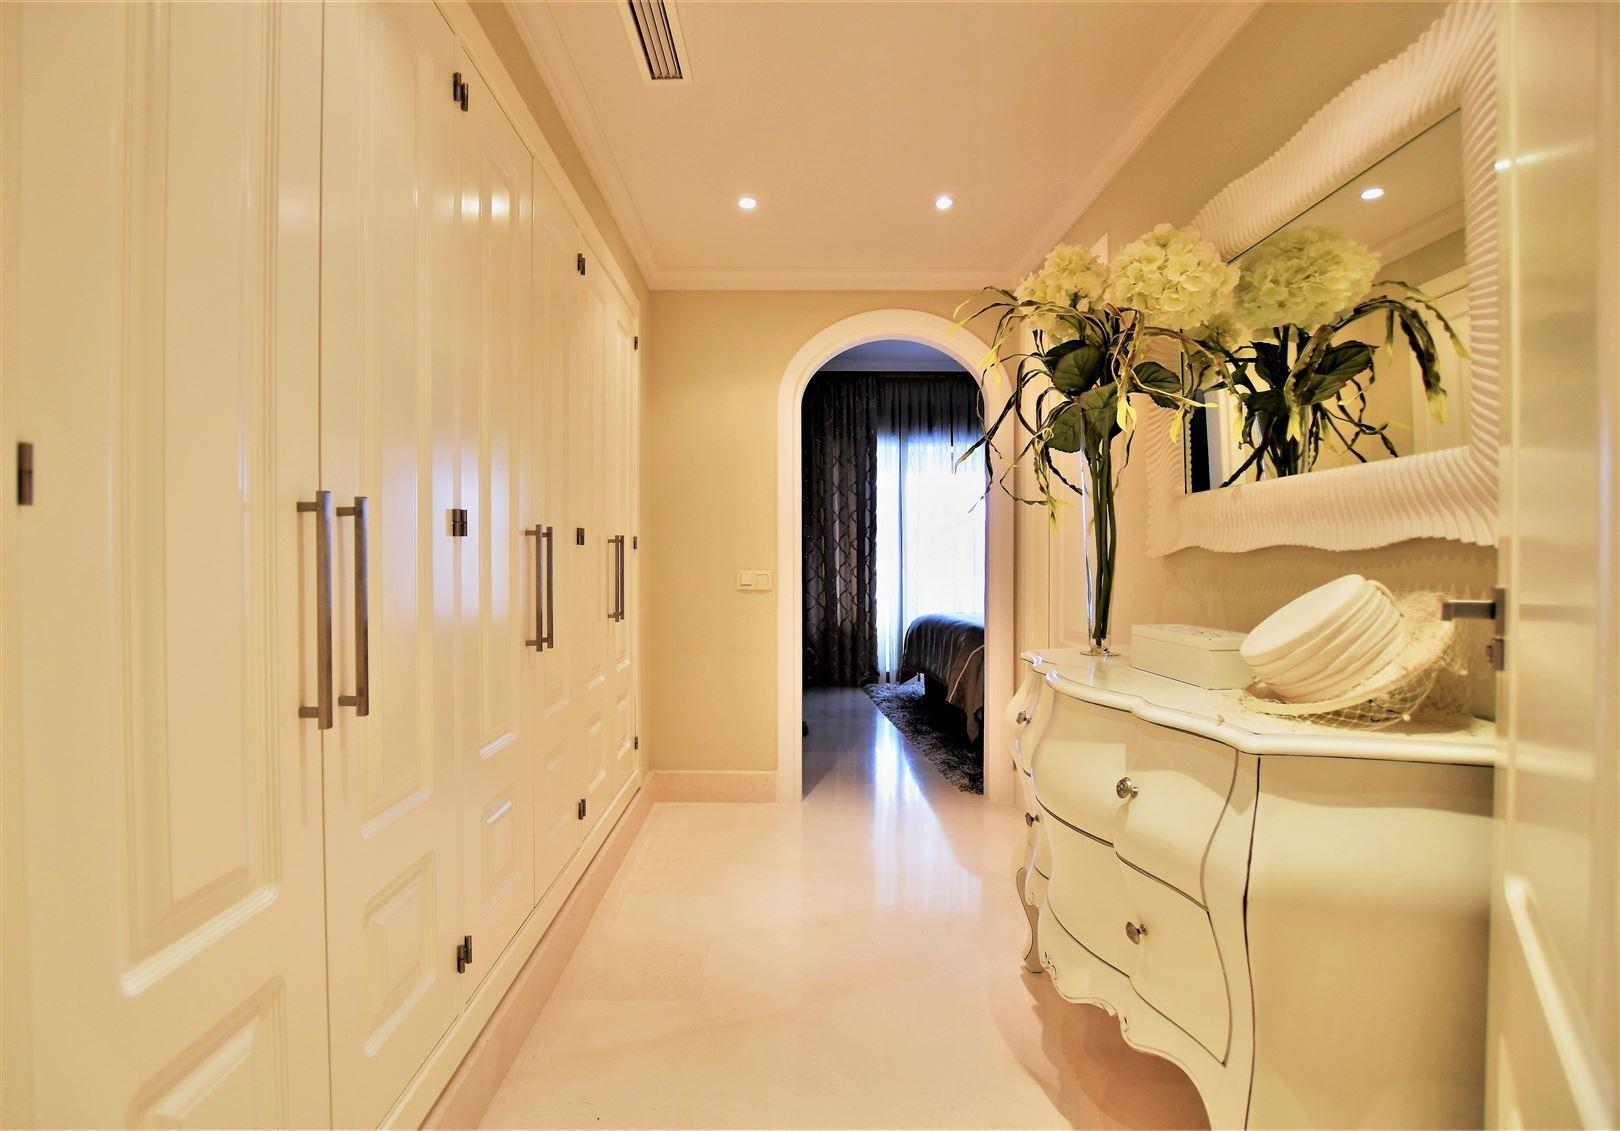 Foto 21 : Appartement te 29679 MARBELLA (Spanje) - Prijs € 1.750